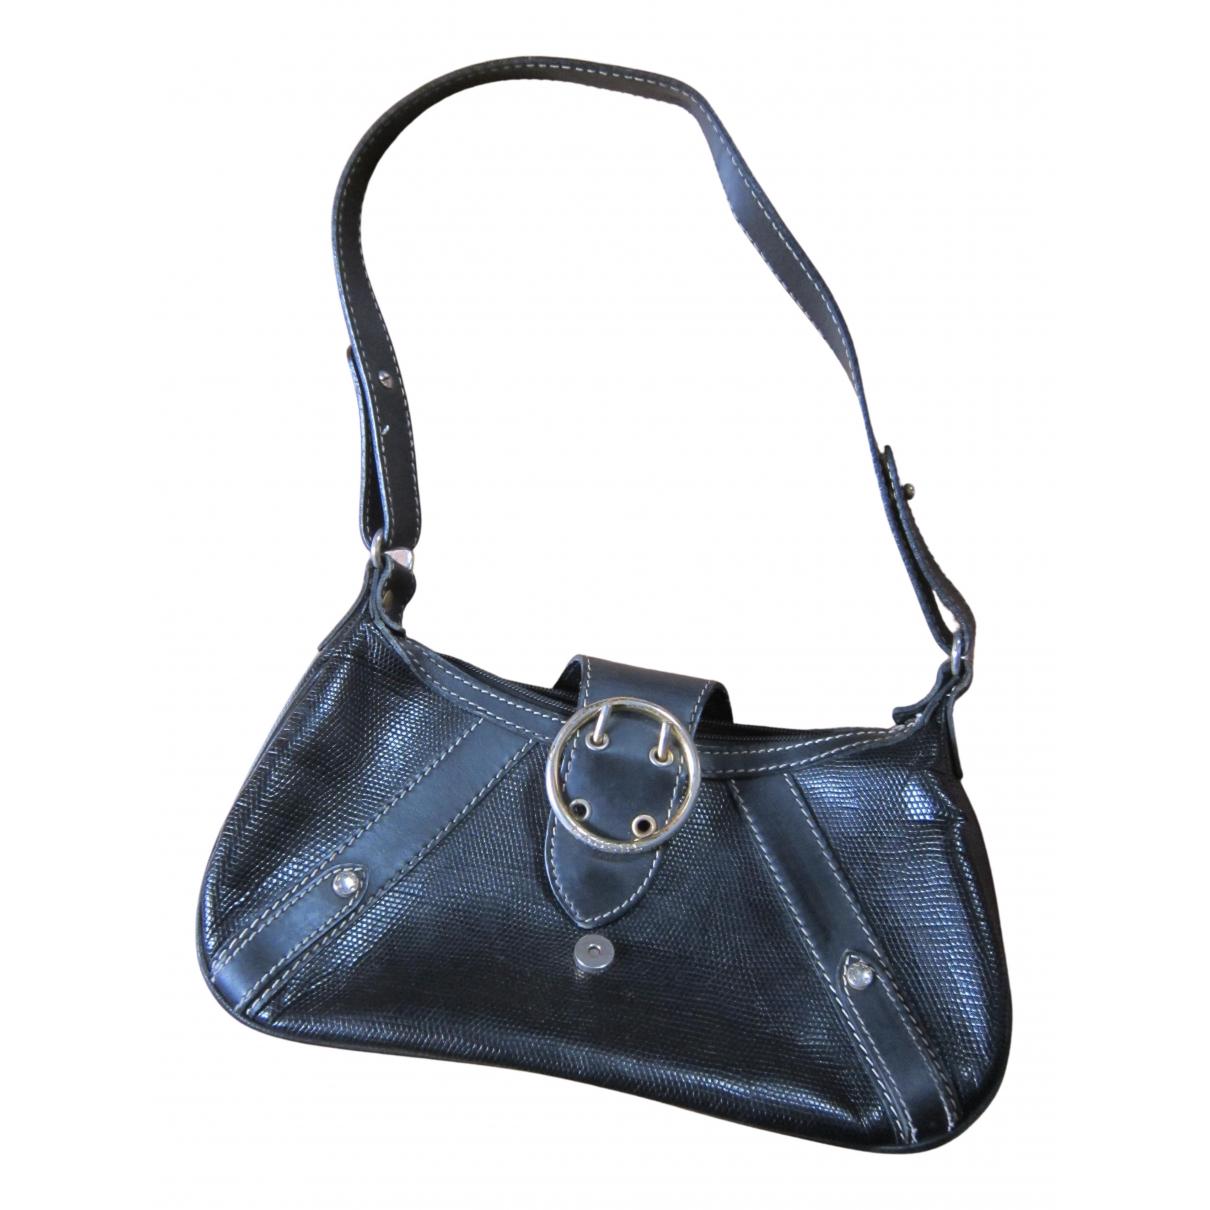 Lancel Elsa Sellier Handtasche in  Schwarz Leder